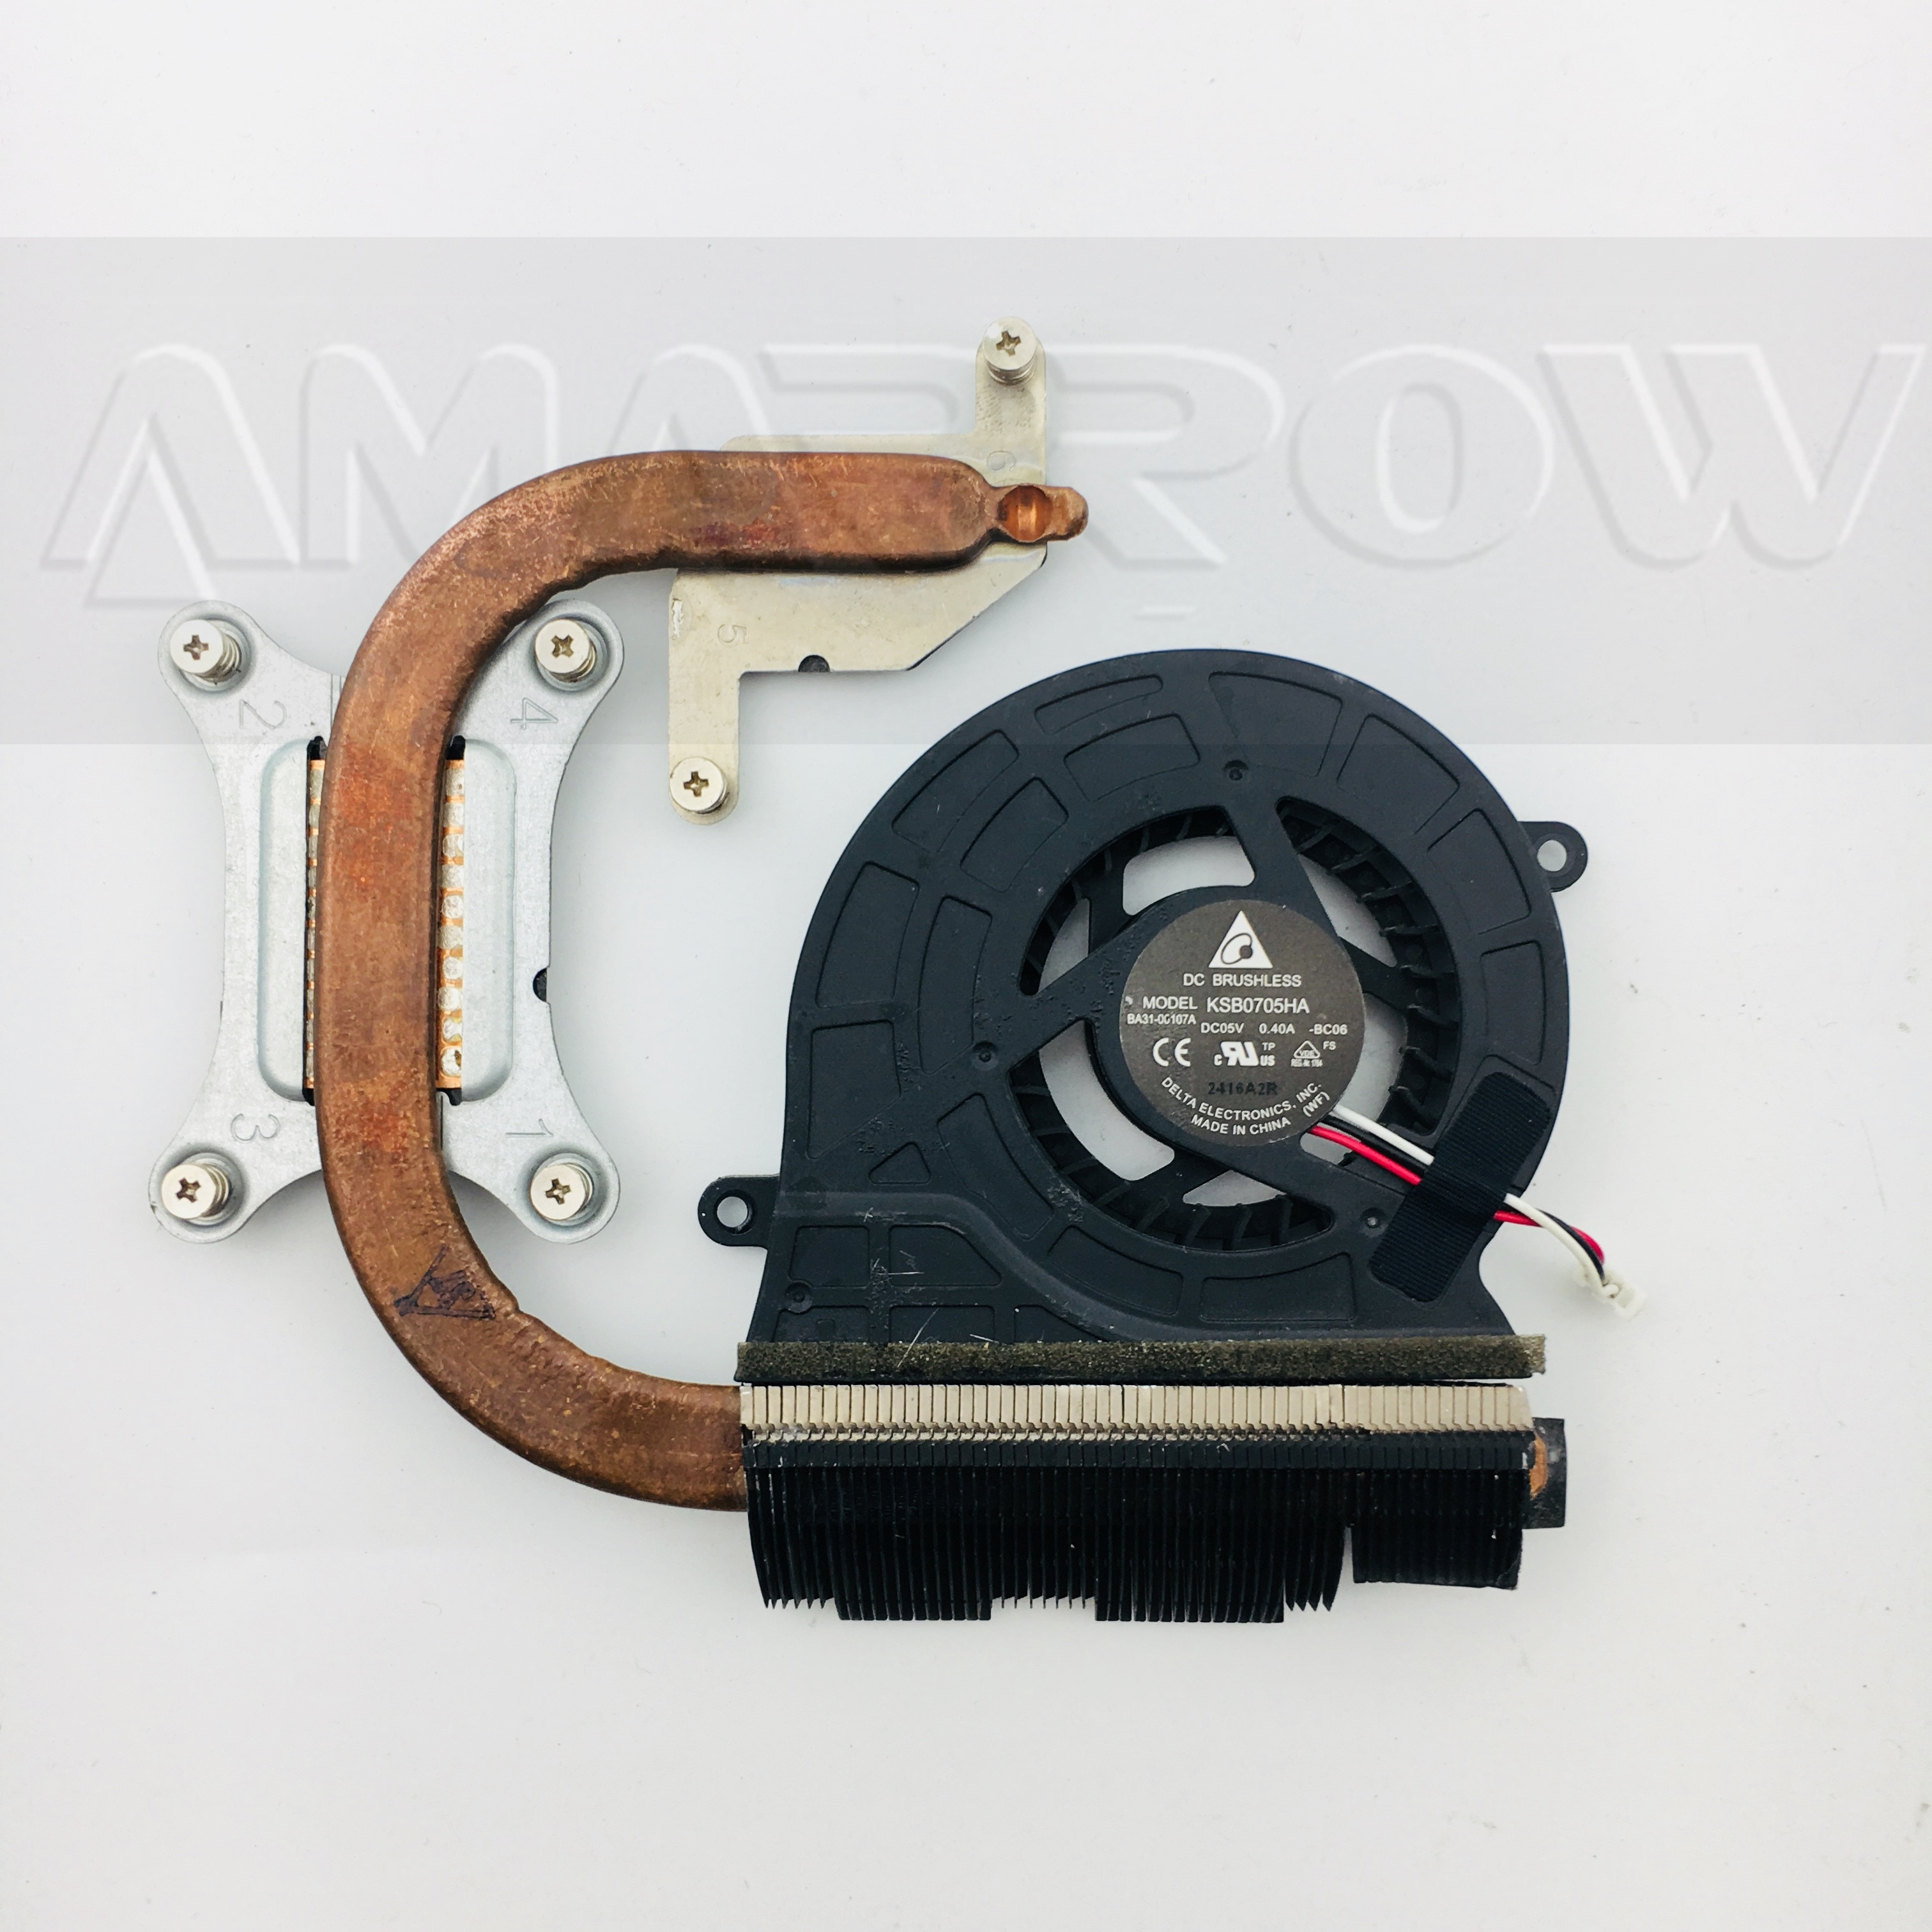 Original laptop cpu heatsink cooling fan For Samsung NP300E4A NP300V4A NP305E5A NP300E5A NP300E5C BA62-00639A BA62-00639B 00639C